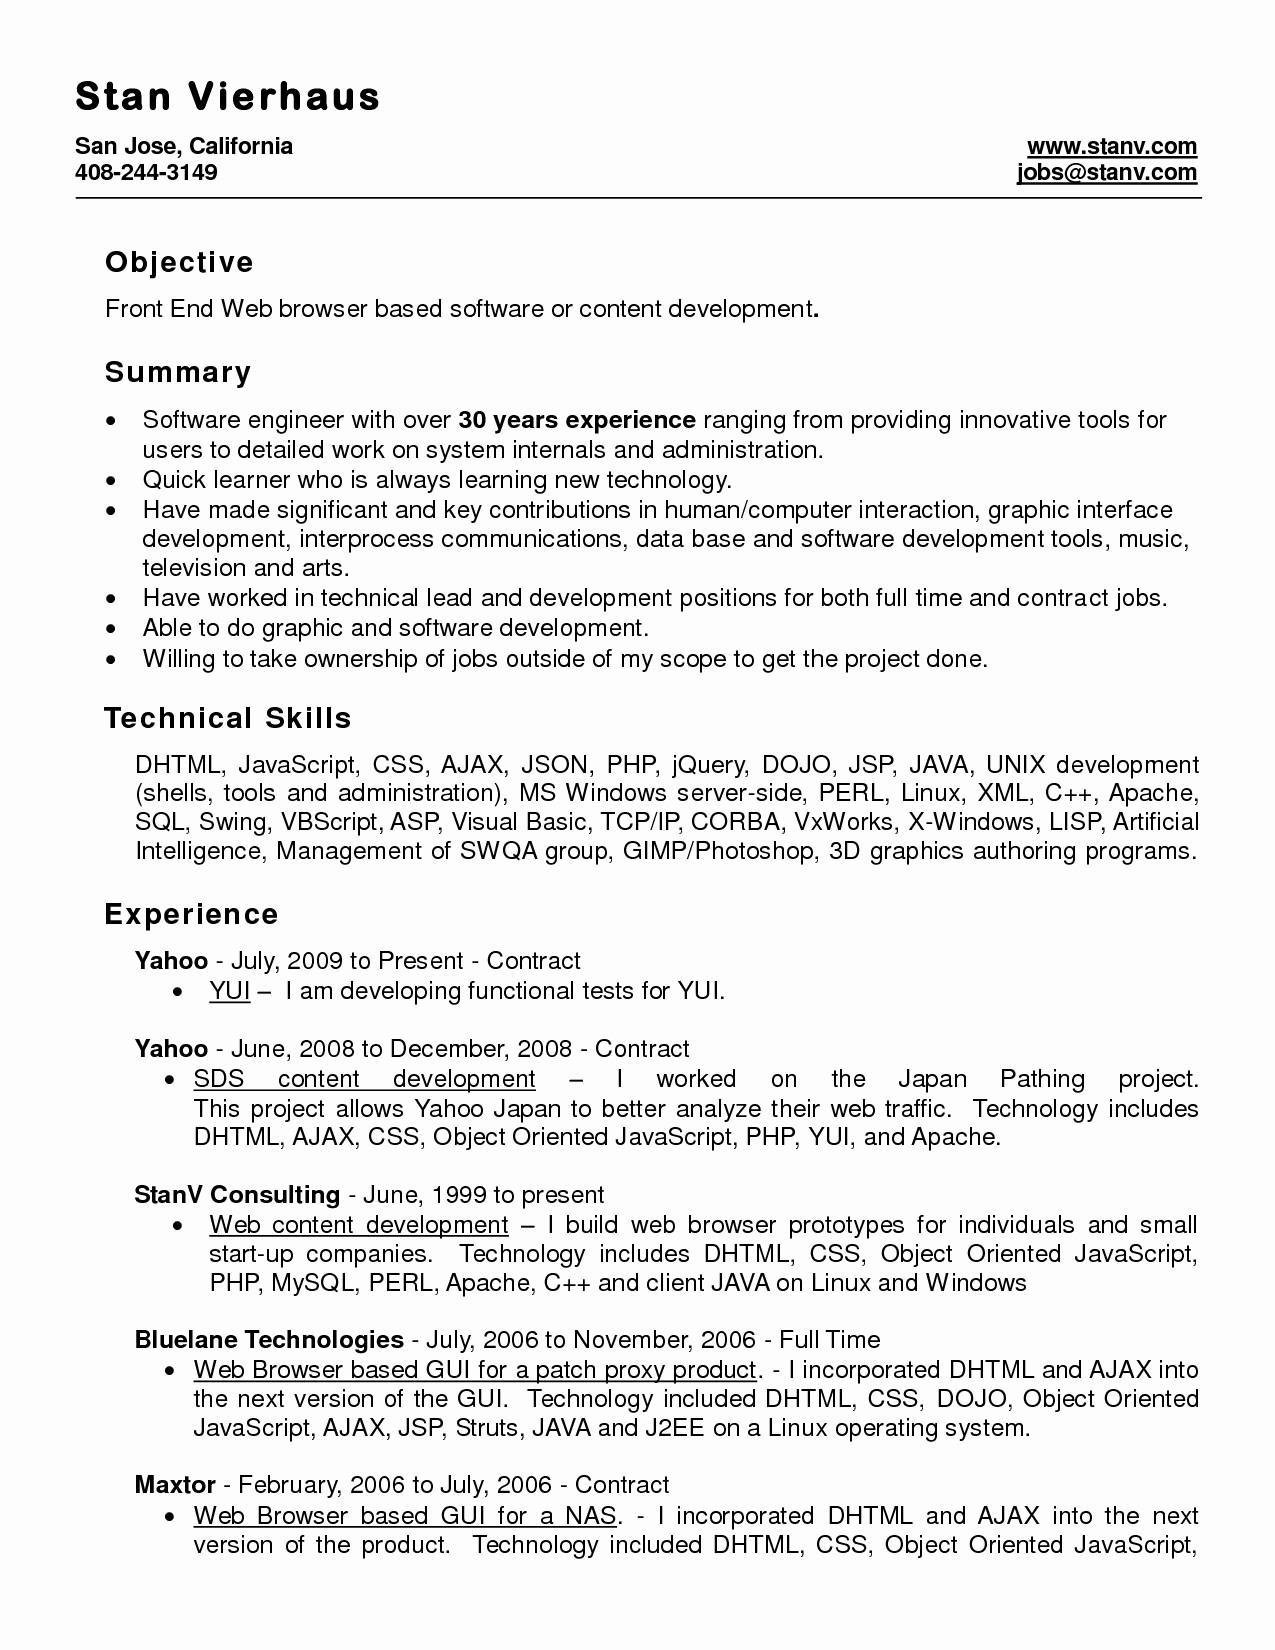 Professional Resume Template Microsoft Word Awesome Resume Template Microsoft Word 2017